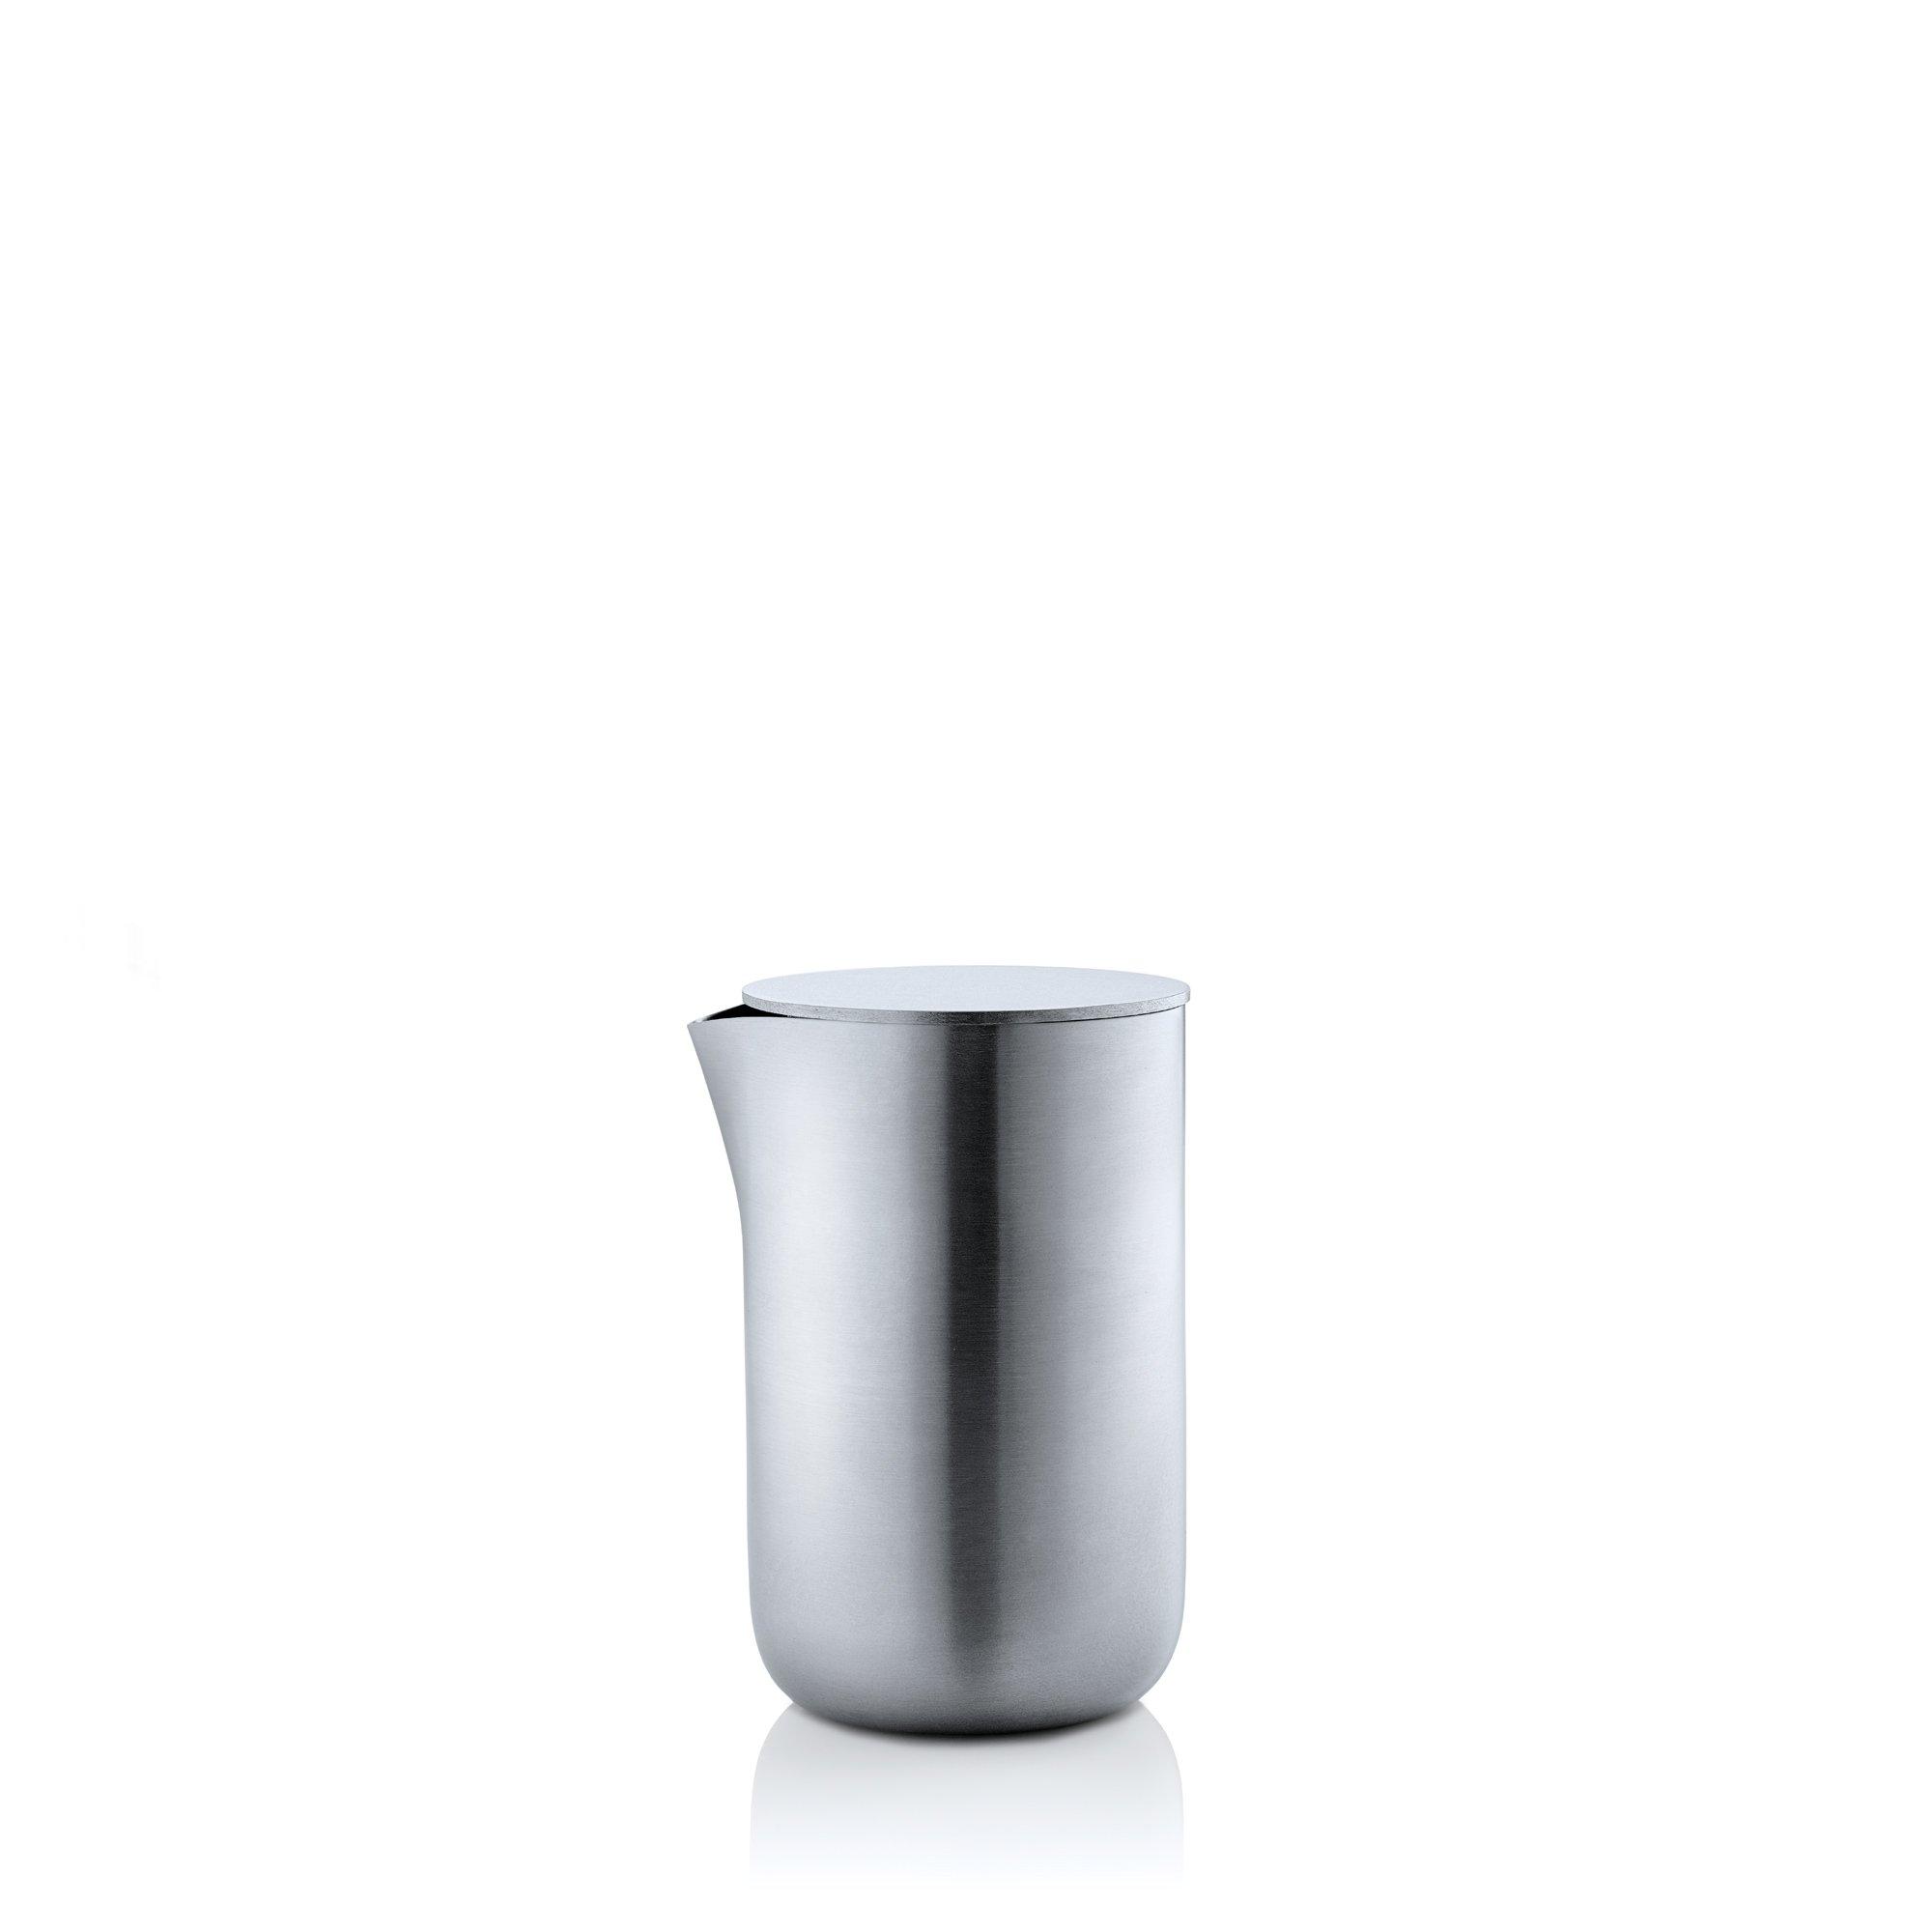 Blomus Basic Stainless Steel Creamer with Lid